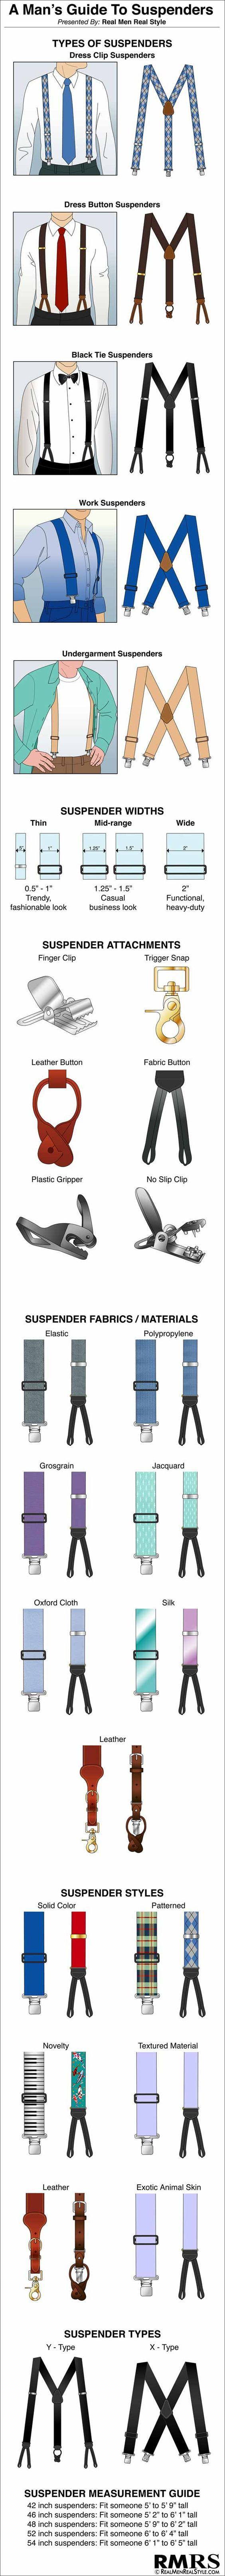 A Man's Guide To Suspenders   Trouser Braces Infographic   Suspender Guide (via @antoniocenteno):